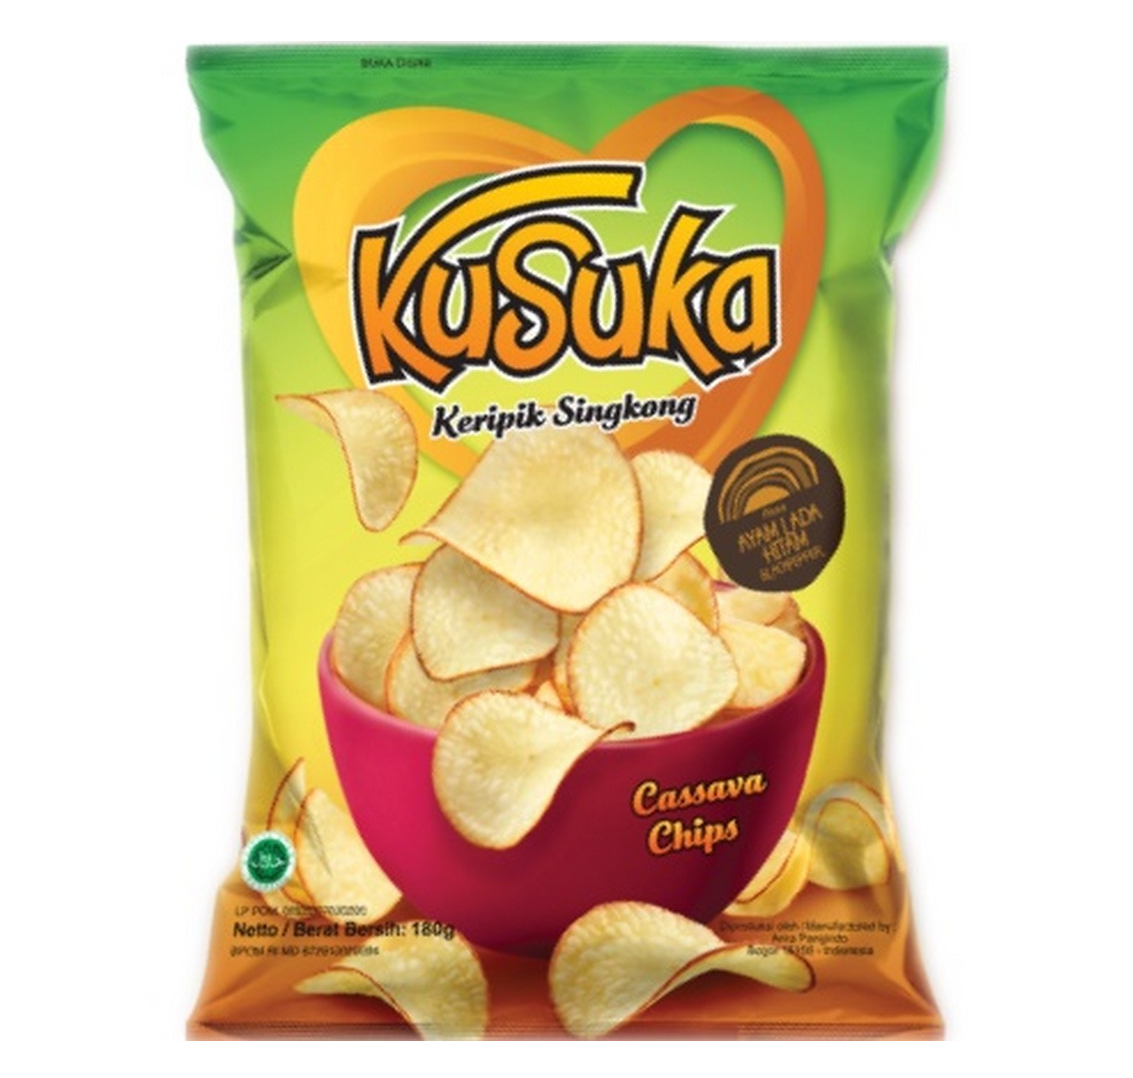 Kusuka cassava chips black pepper